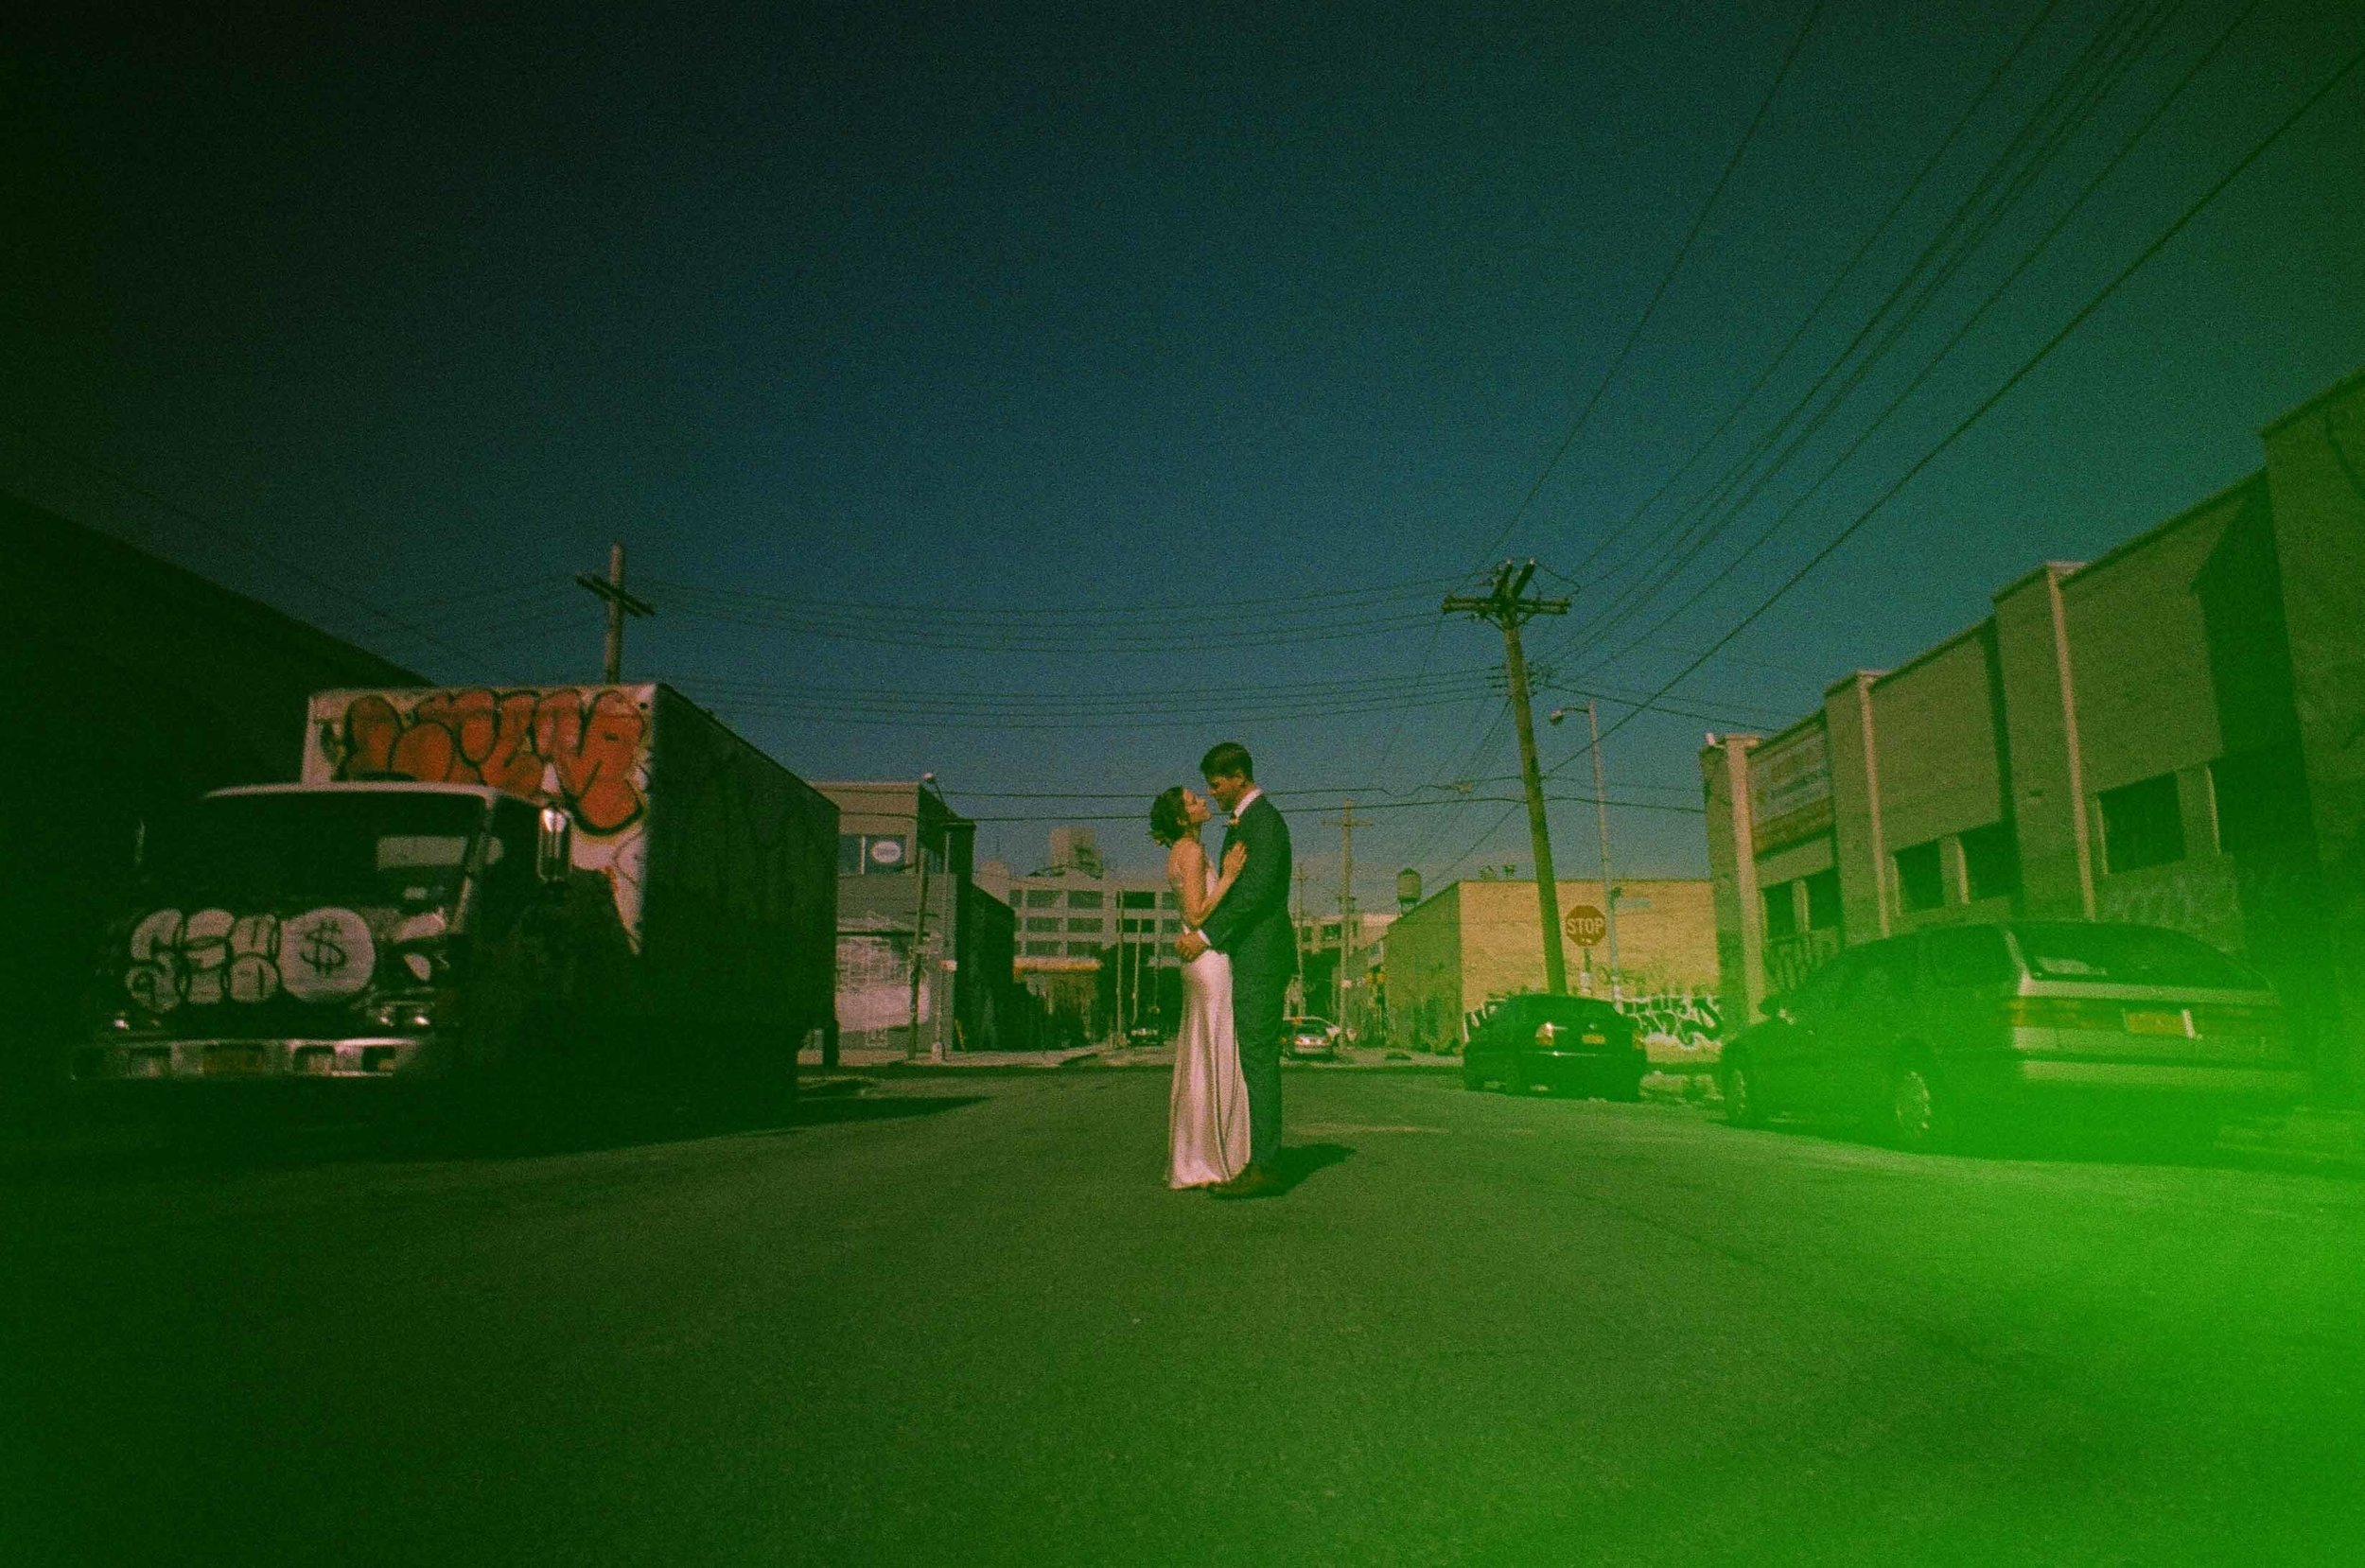 35mm_Film_Wedding_Photographer_Chellise_Michael_Photography-22.jpg